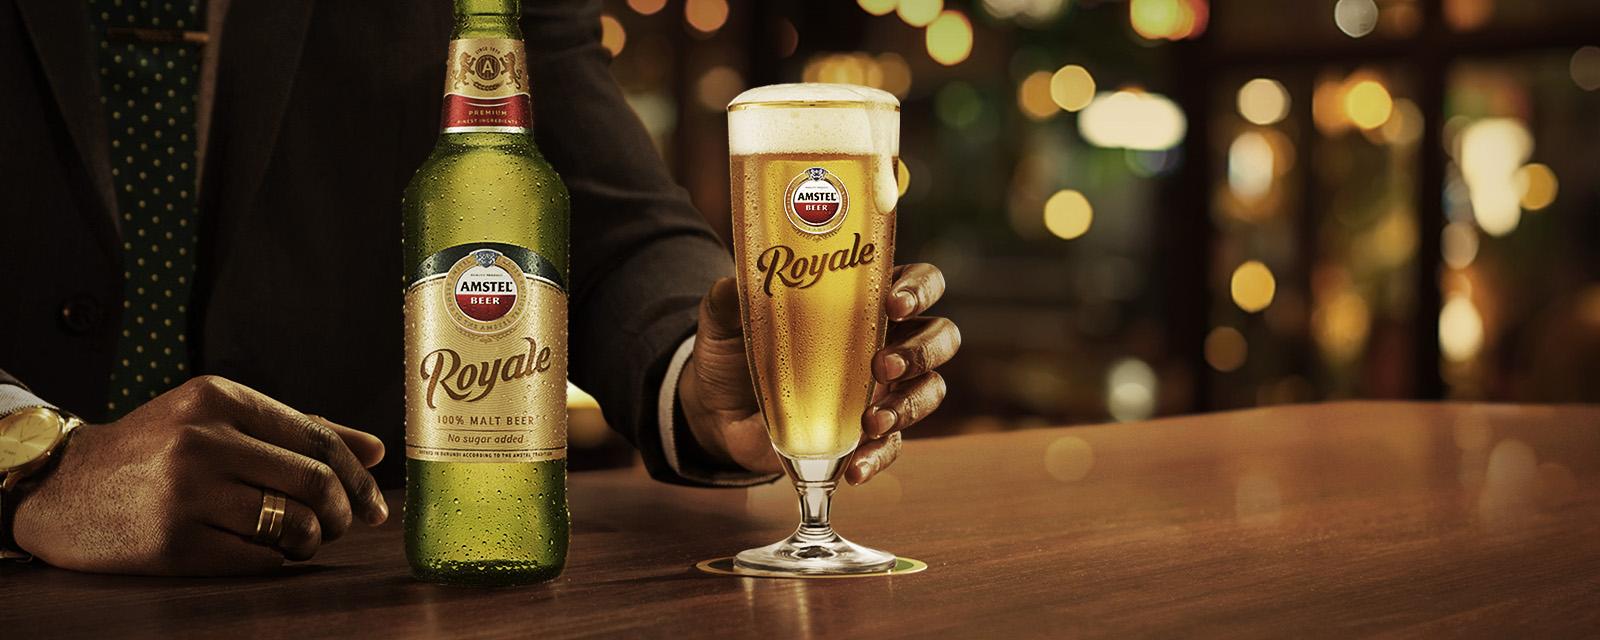 Amstel Royale